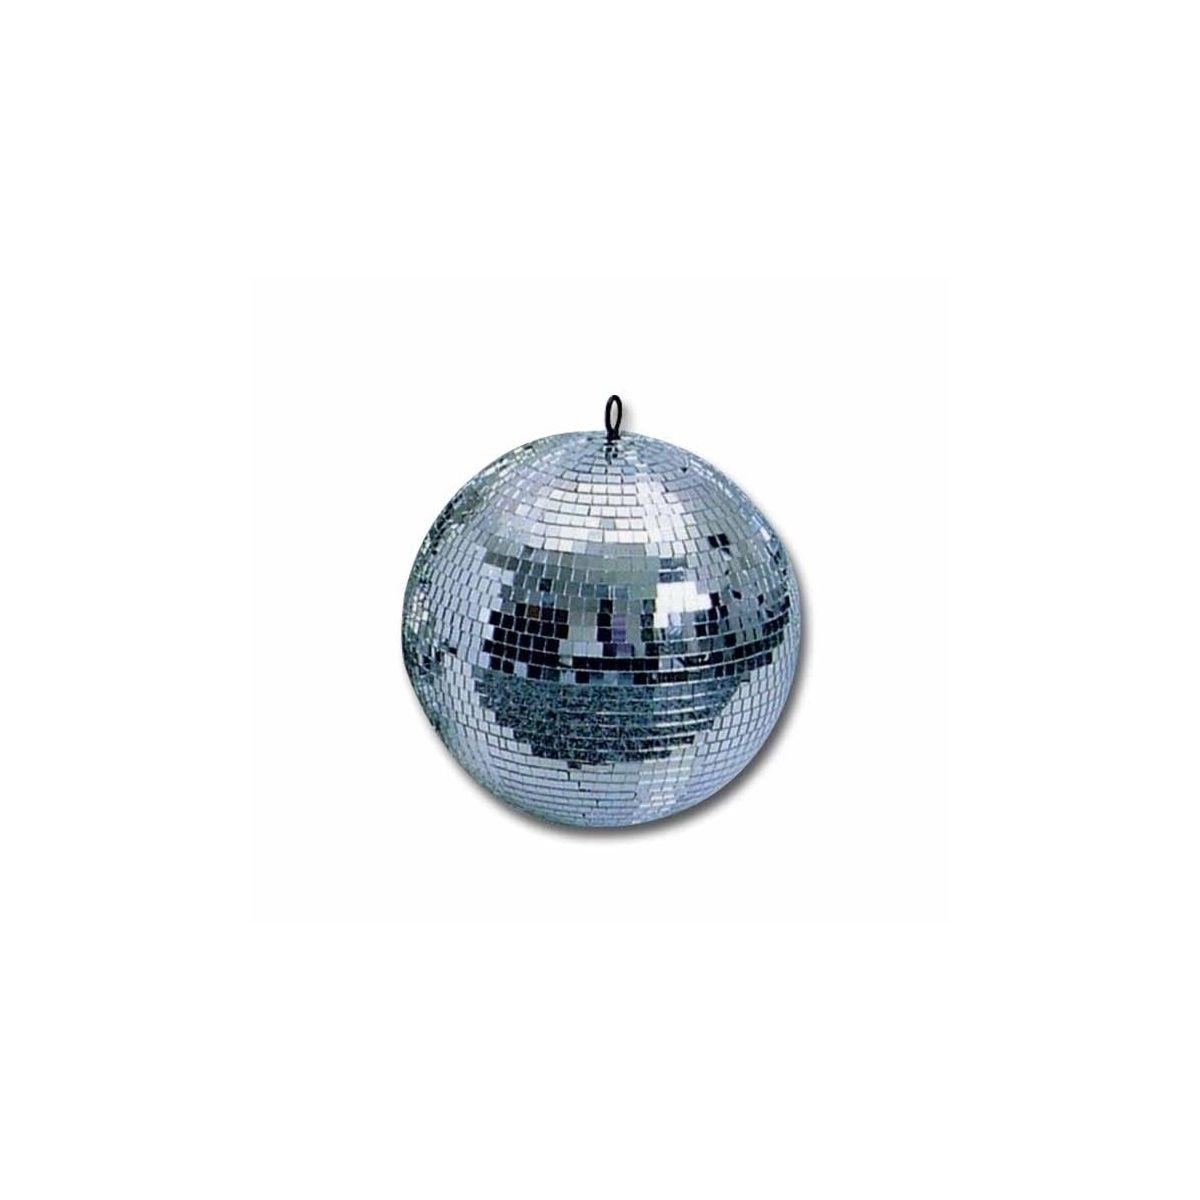 "Boules à facettes - JB Systems - MIRROR BALL 12""/30cm"